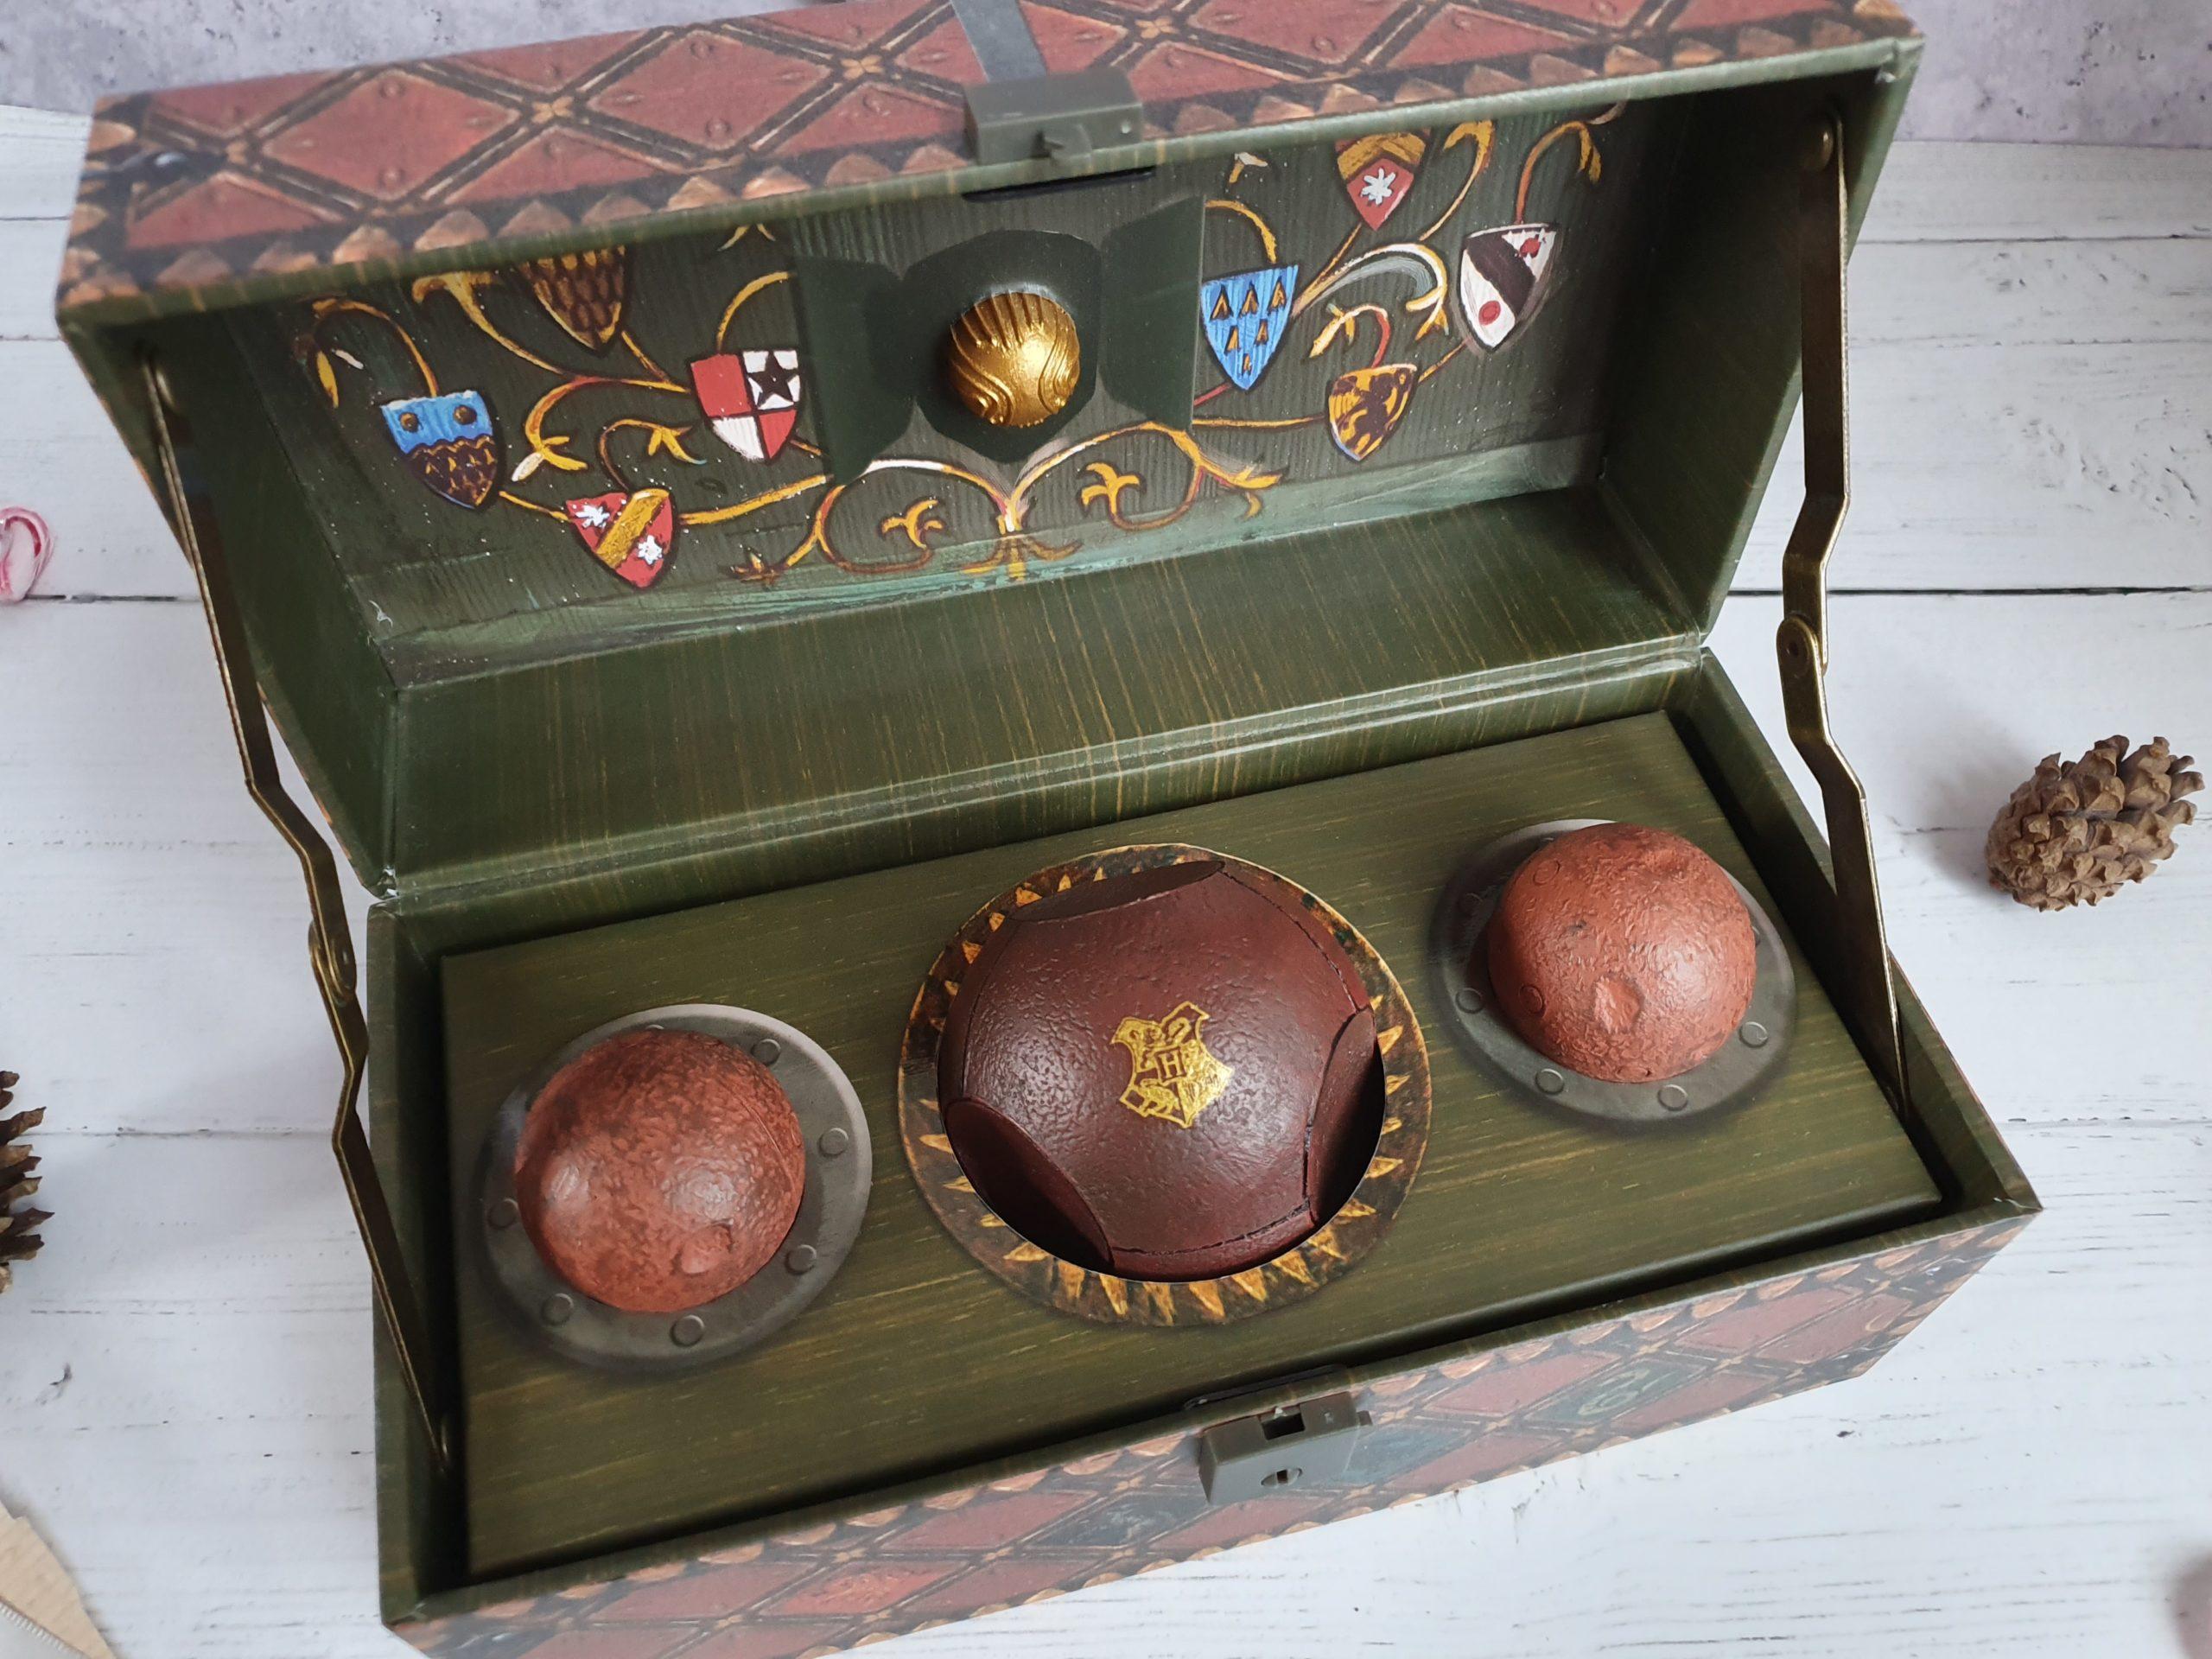 Collectible quidditch set